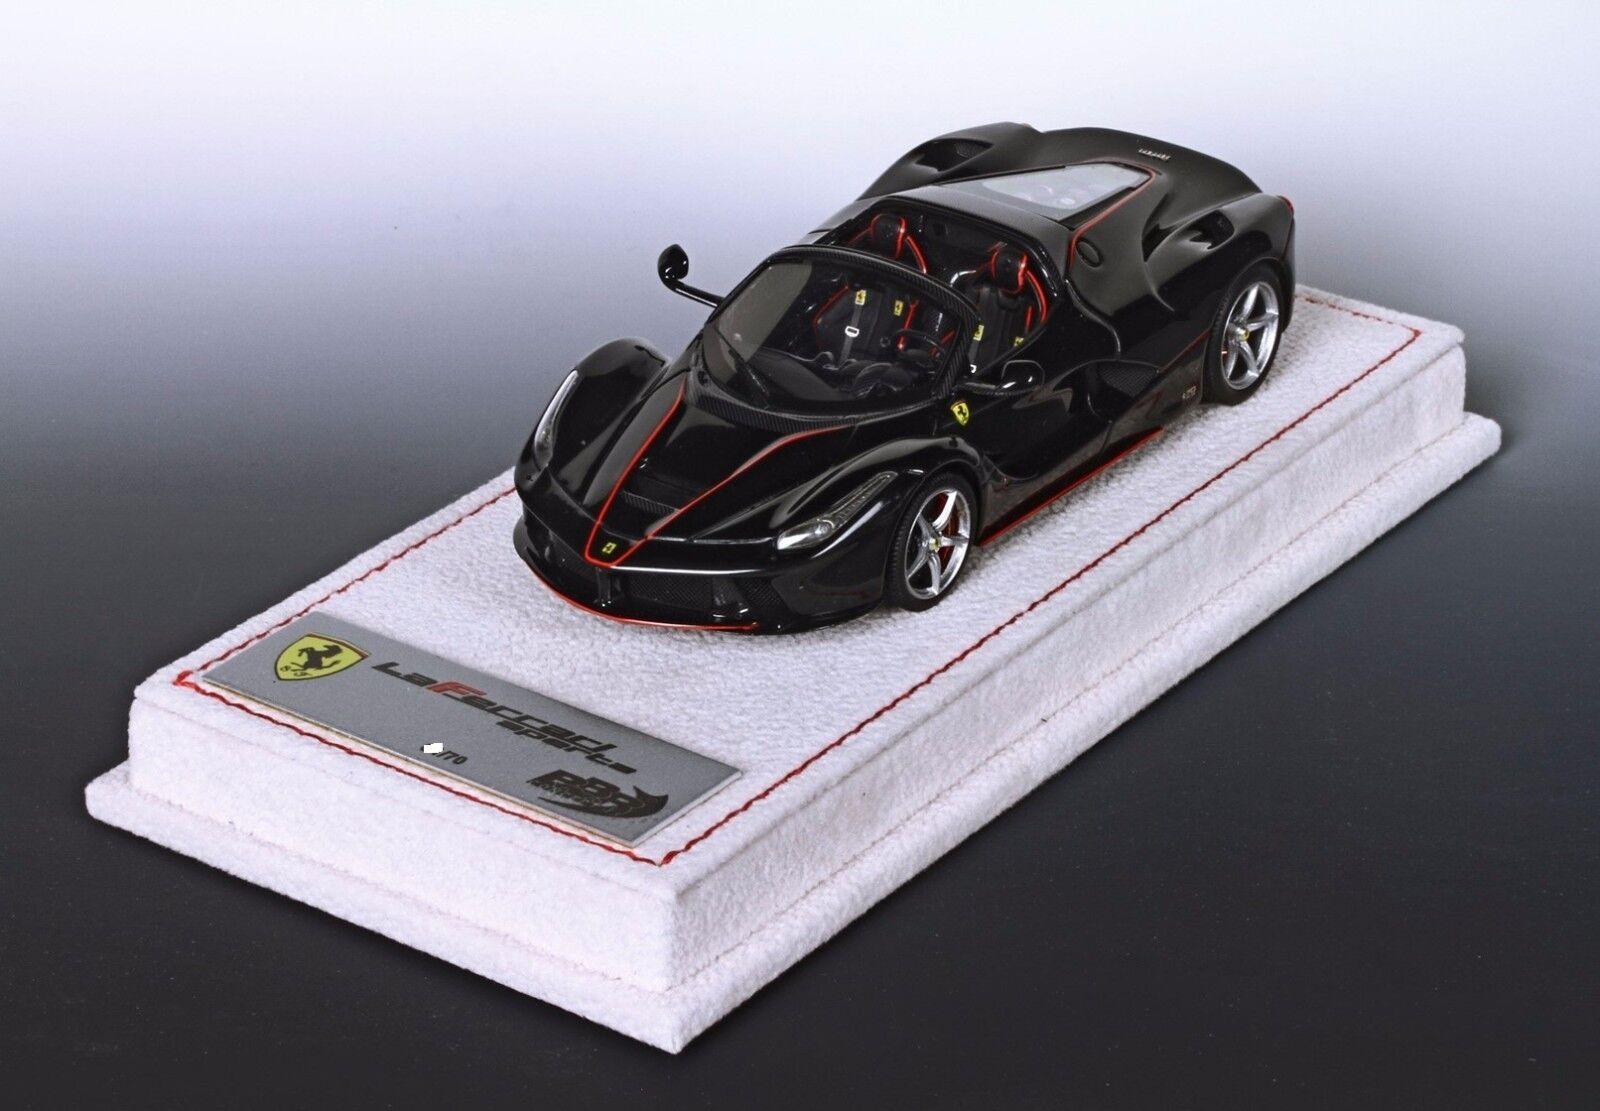 più economico Ferrari LaFerrari Aperta 2016 nero Daytona Daytona Daytona 1 43 lim.ed.70 pcs BBRC187A  vanno a ruba